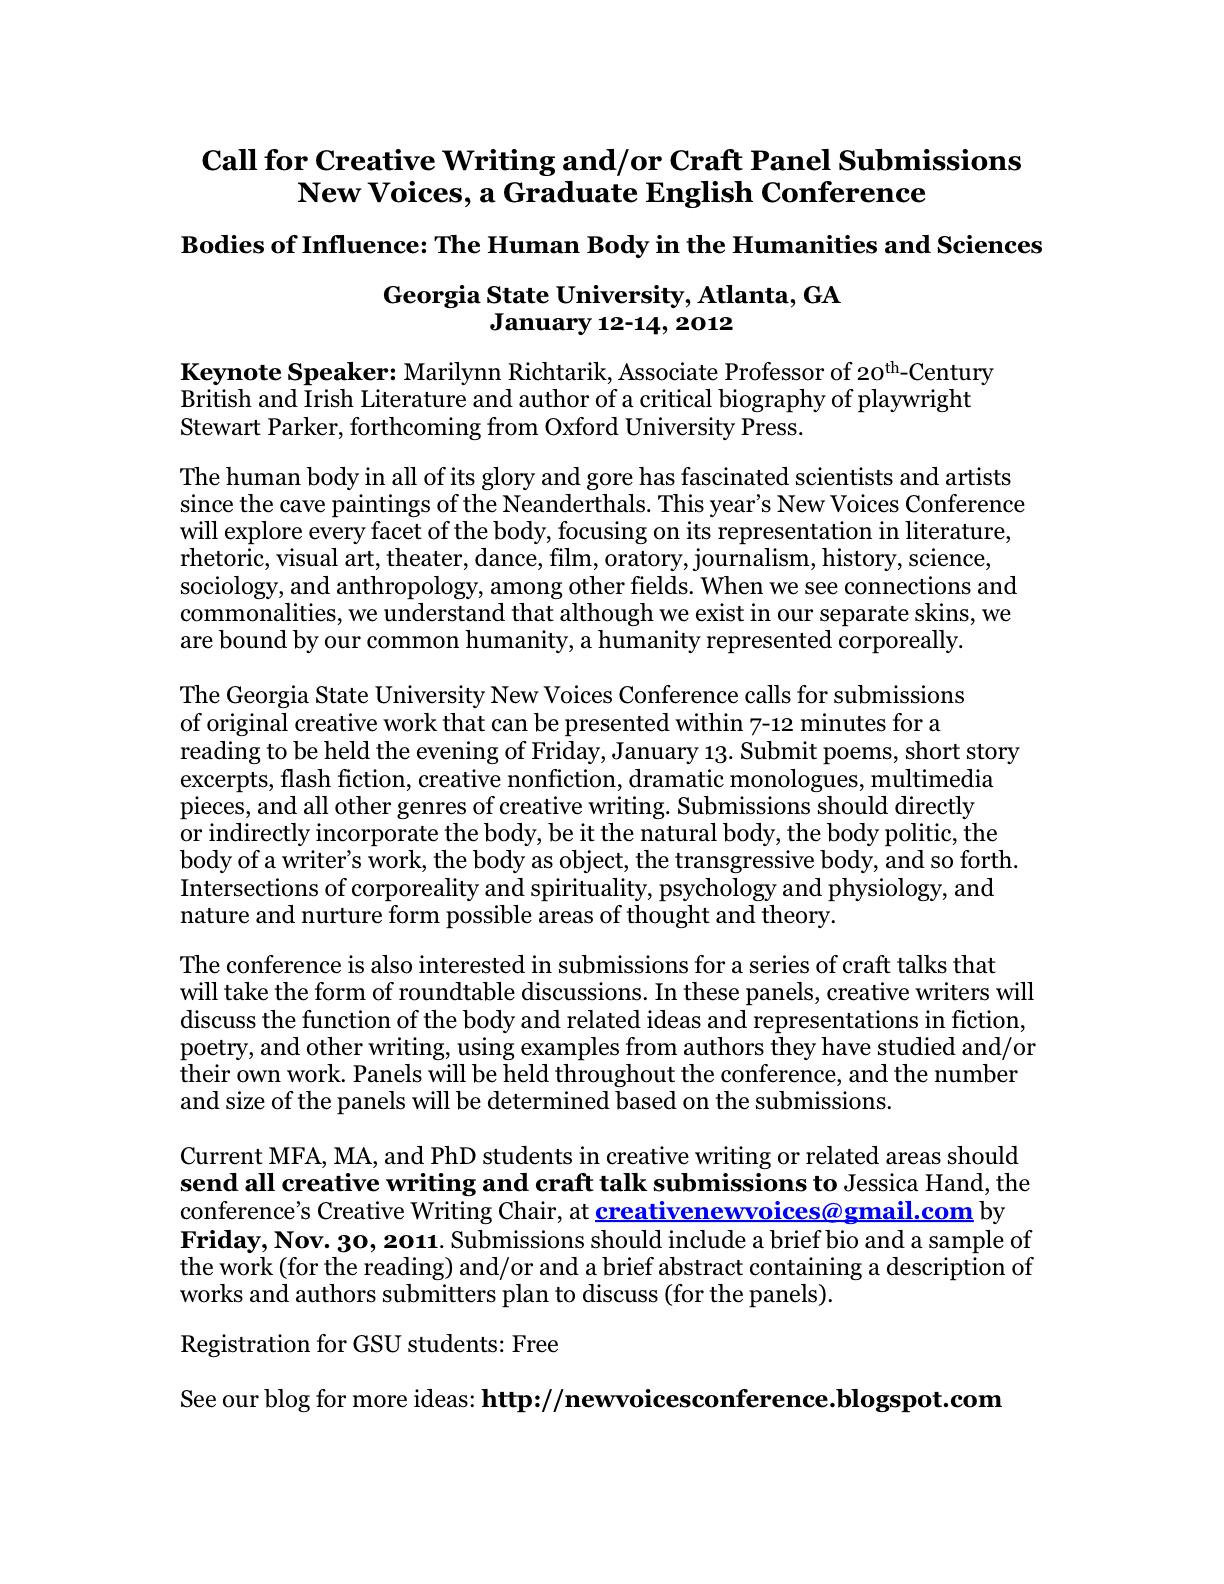 Creative writing phd research proposal